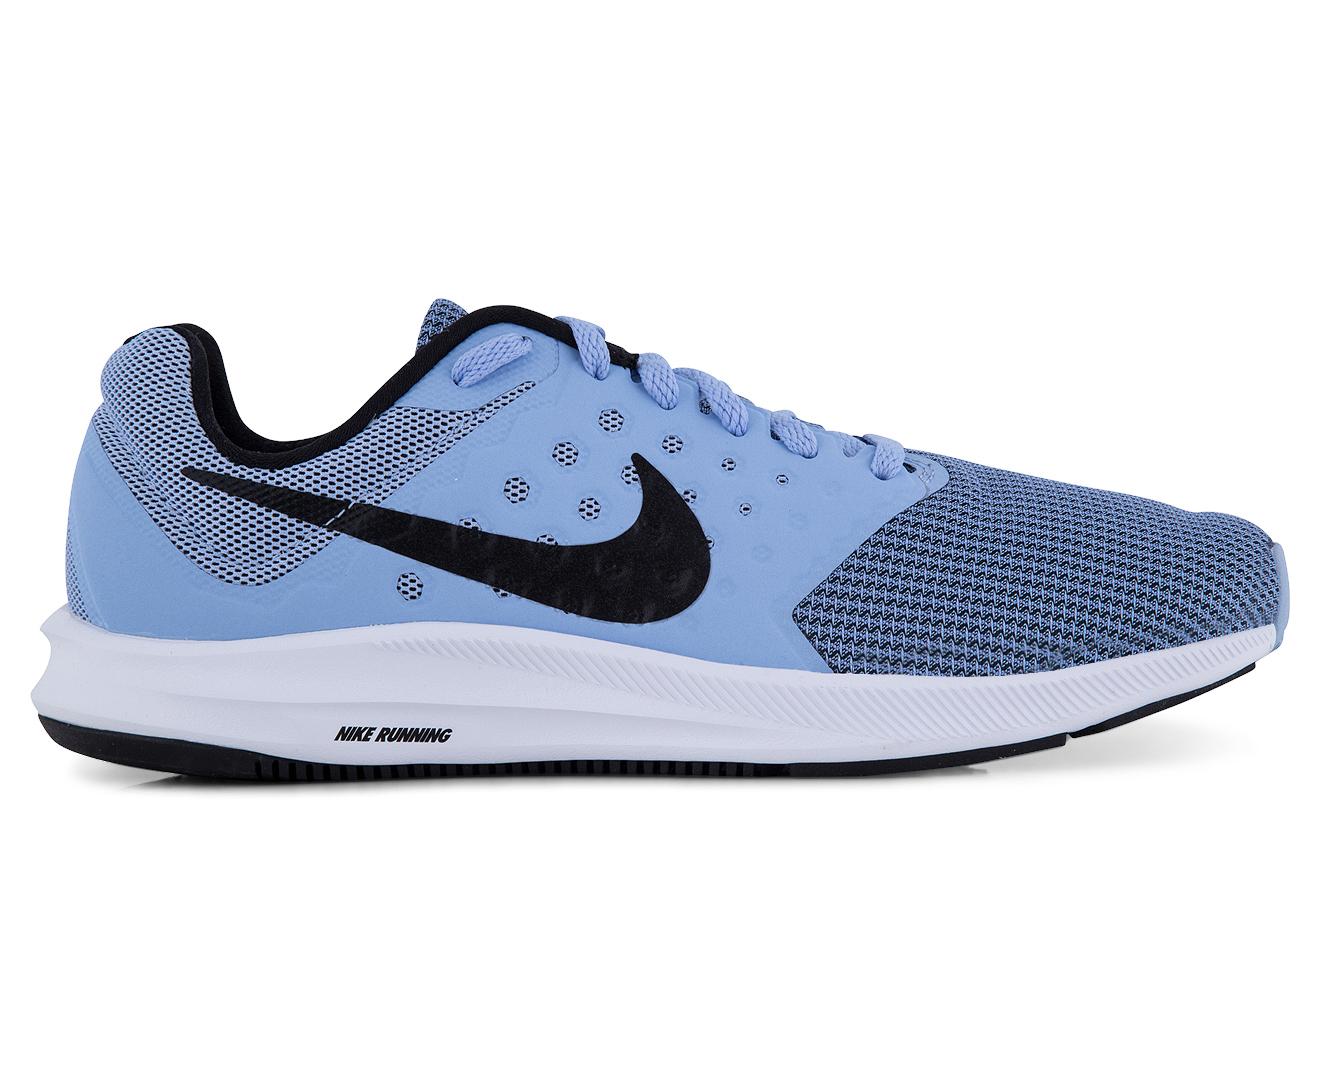 c4a86331d946c Nike Women s Downshifter 7 Shoe - Aluminium Black-White